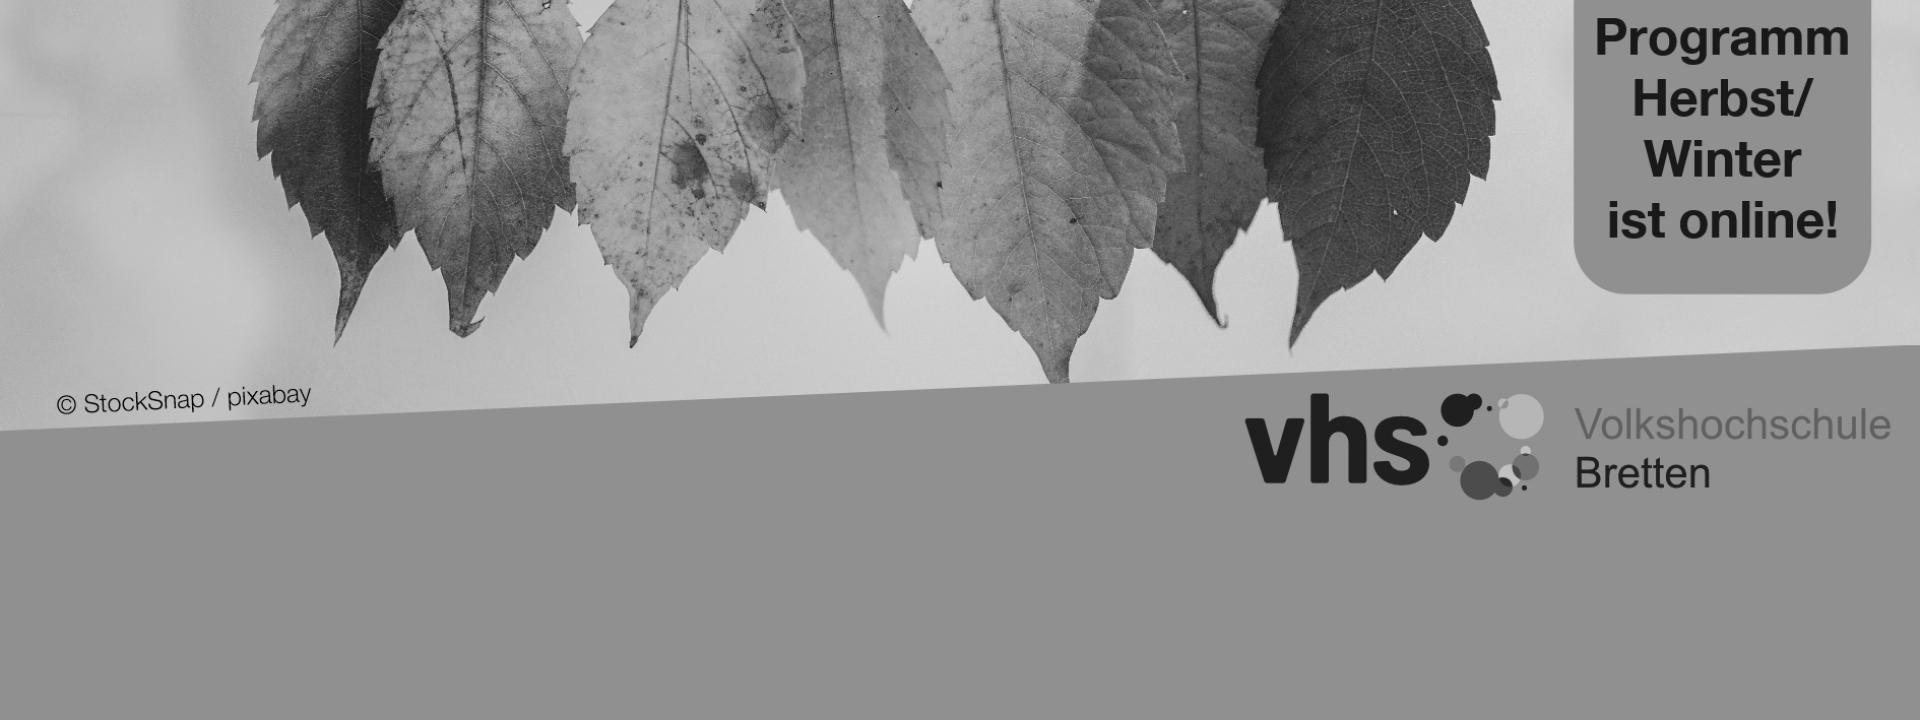 Titelbild neues vhs-Programm